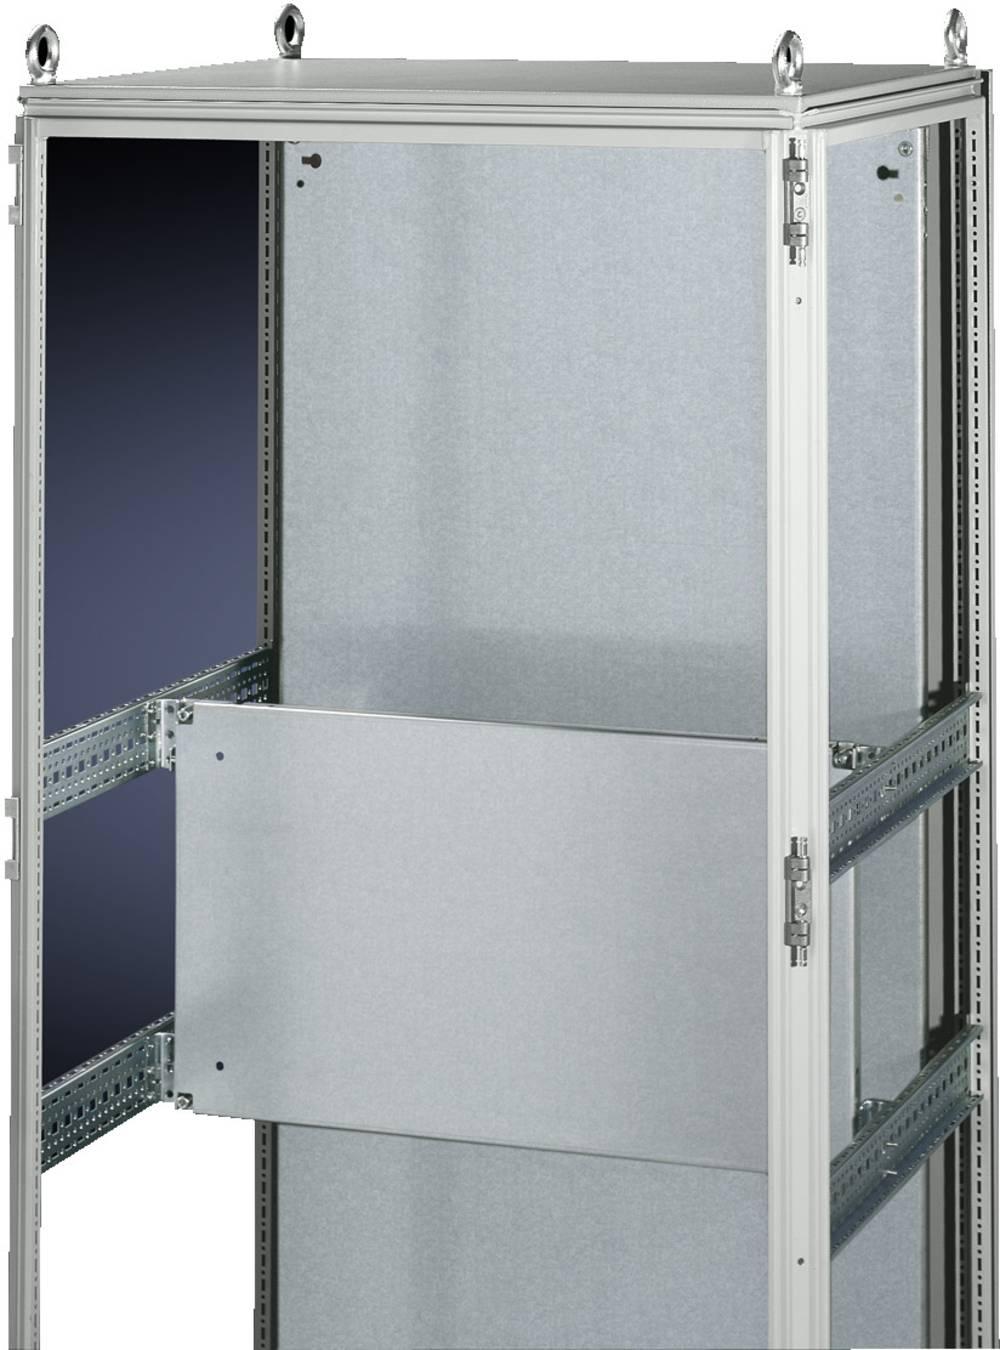 Monteringsplade Rittal TS 8614.840 (B x H) 700 mm x 300 mm Stålplade 1 stk